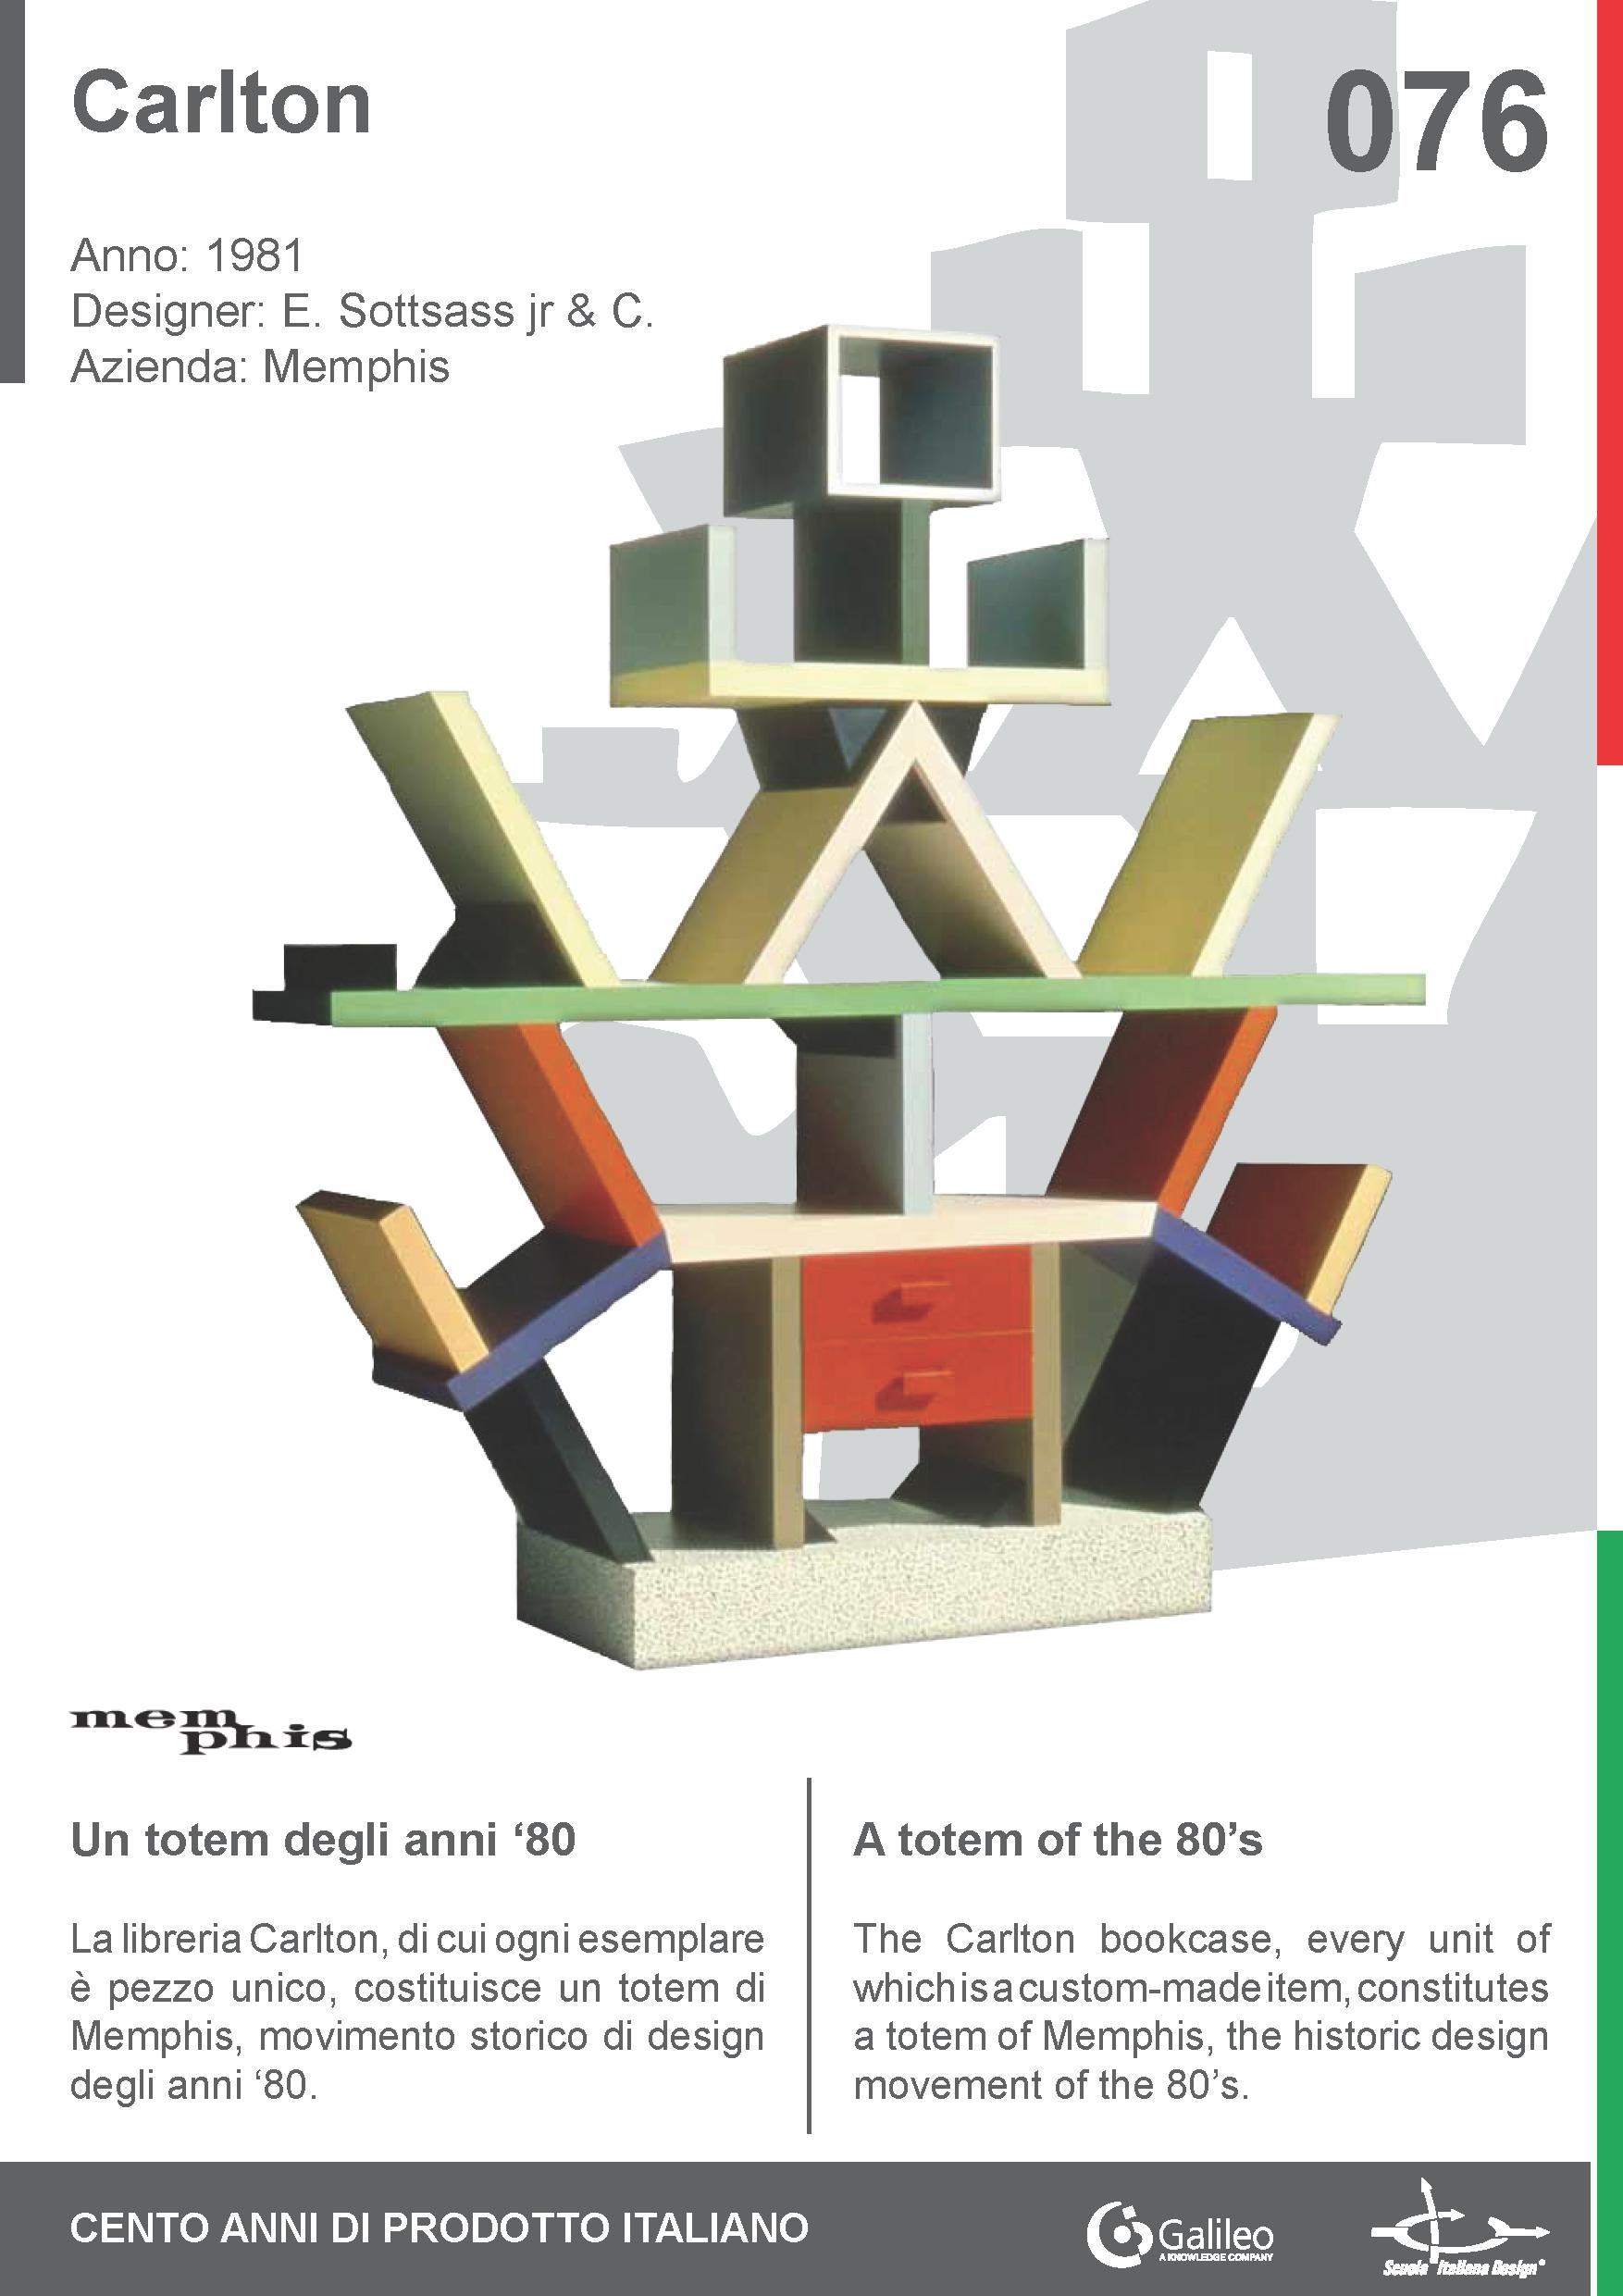 Carlton by Ettore Sottsass jr & C. for Memphis (1981) #bookcase #libreria #furniture #arredo